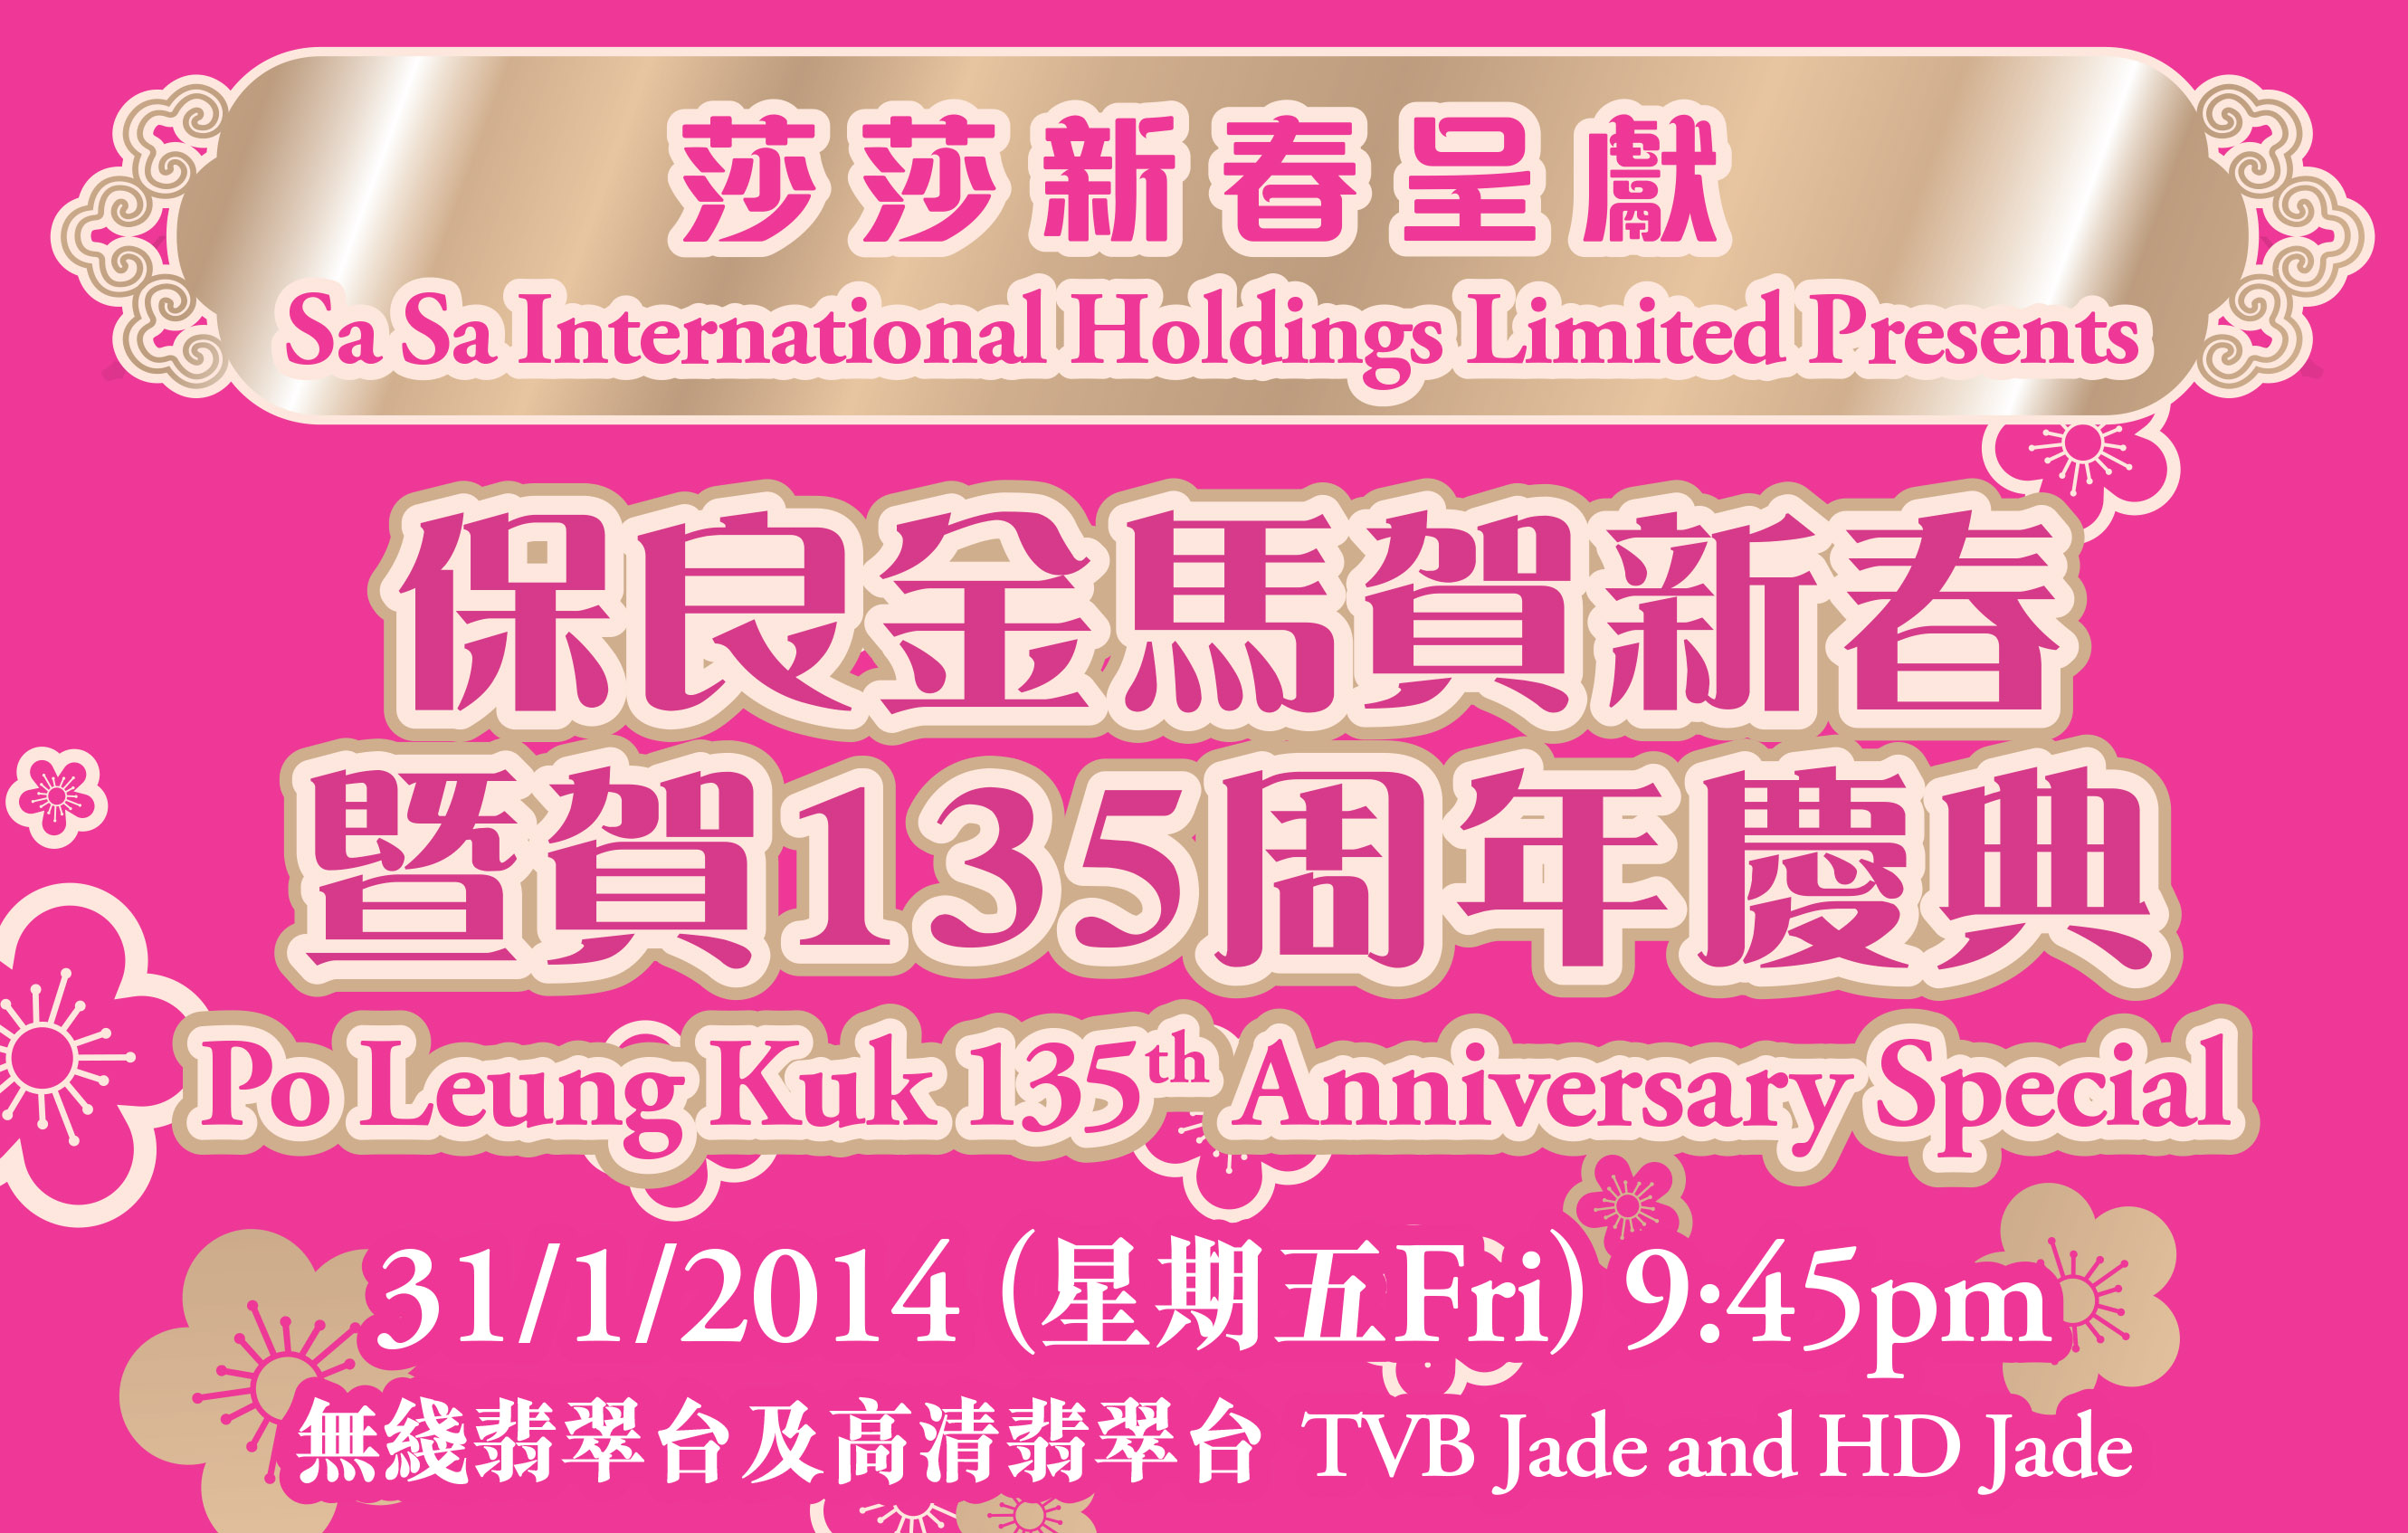 Po Leung Kuk 135th Anniversary – 保良金馬賀新春